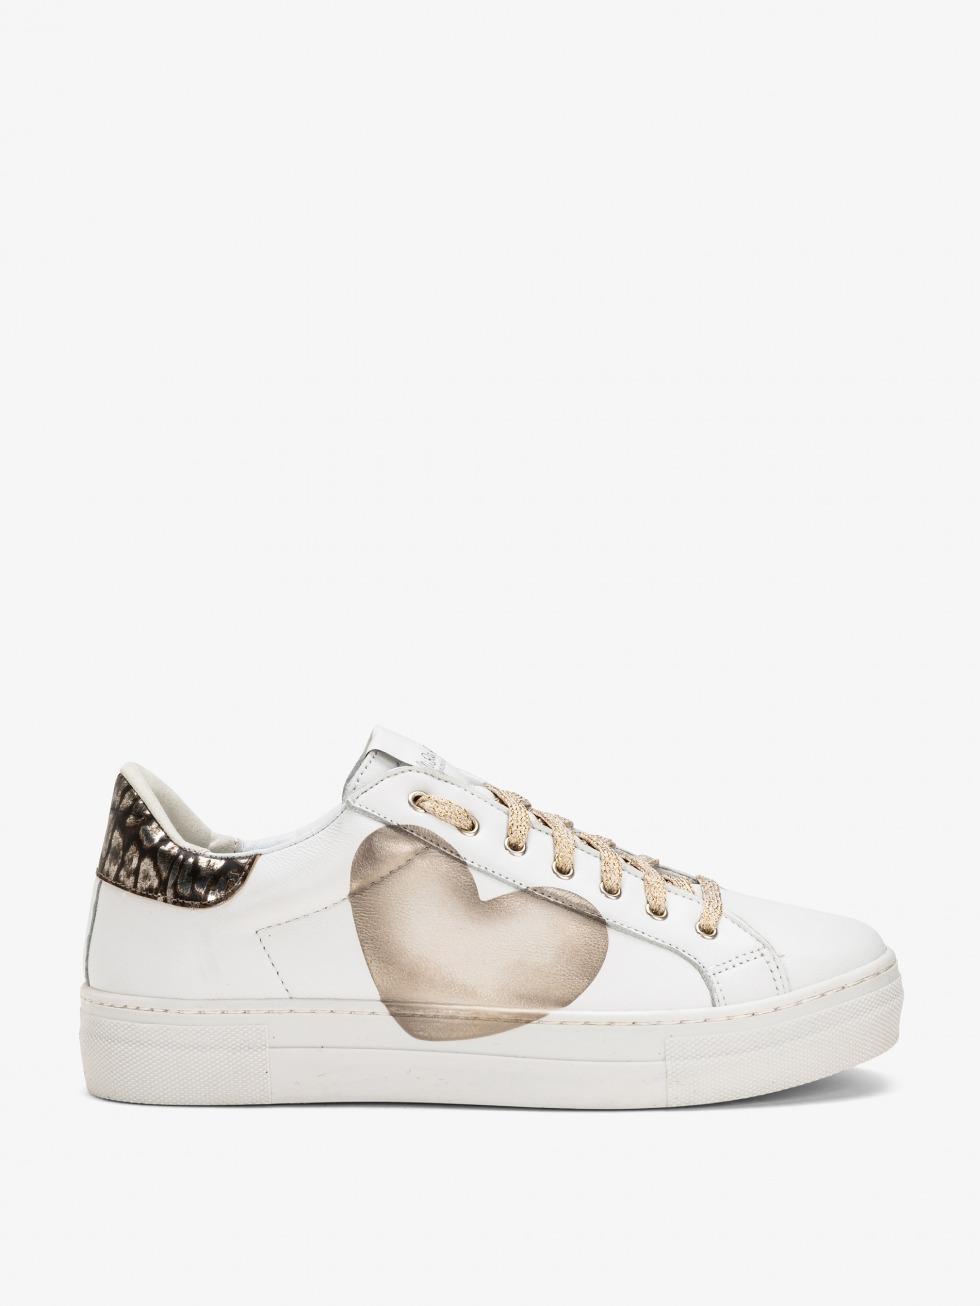 Sneakers Martini Bianco - Cuore Jaguar Silver